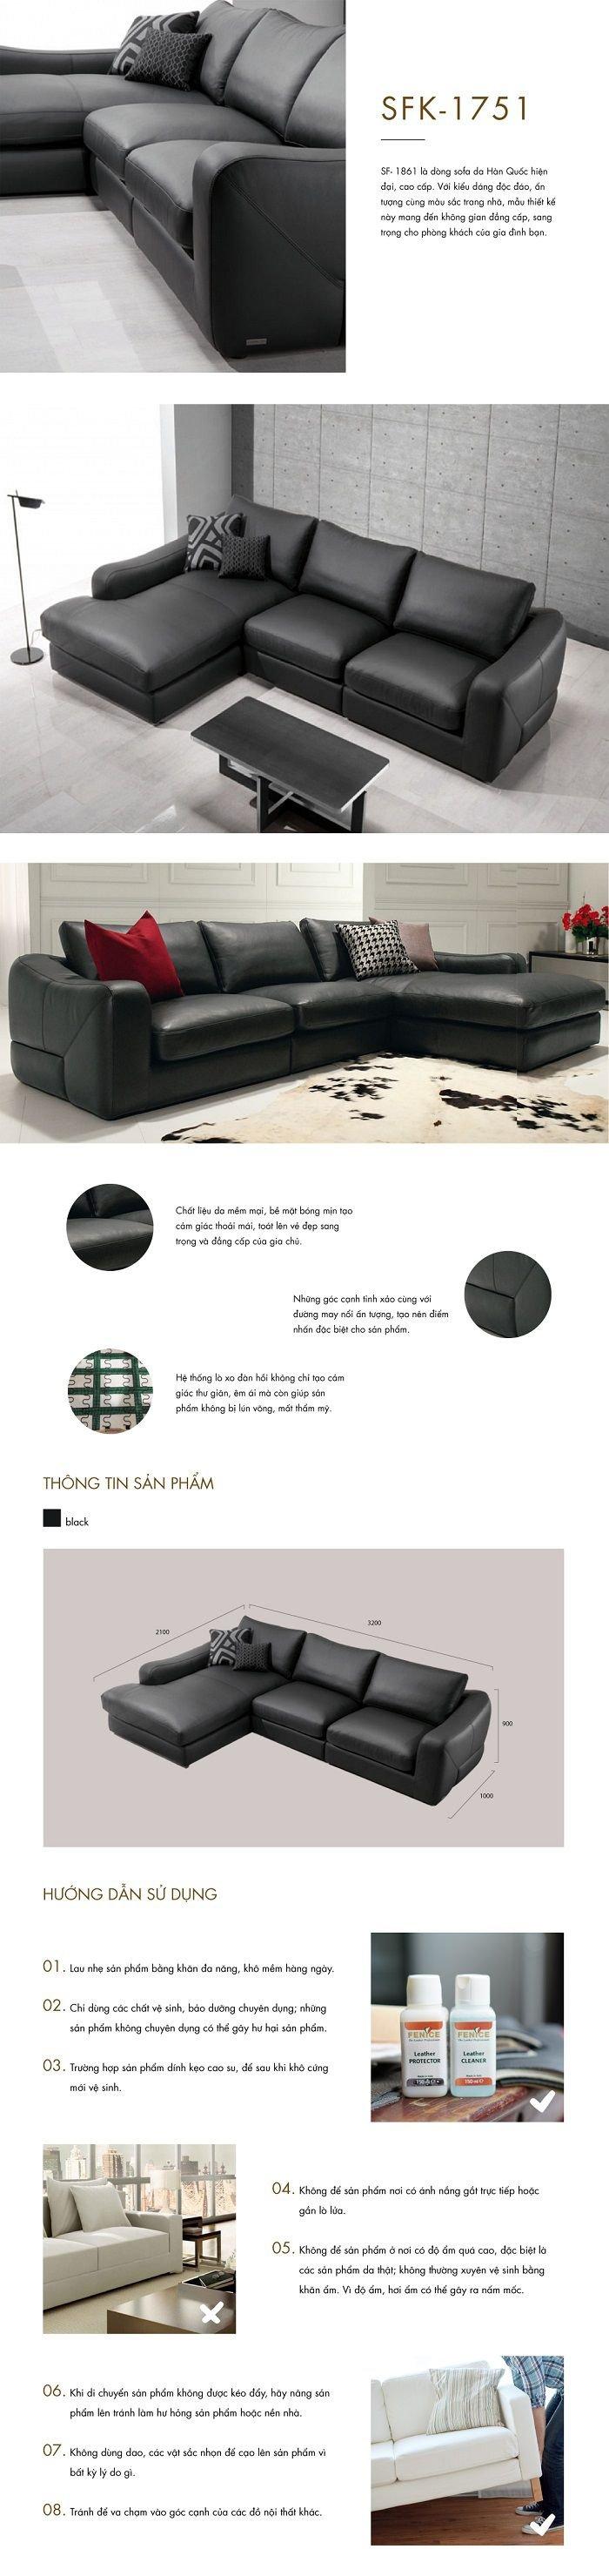 Sofa SKF 1751